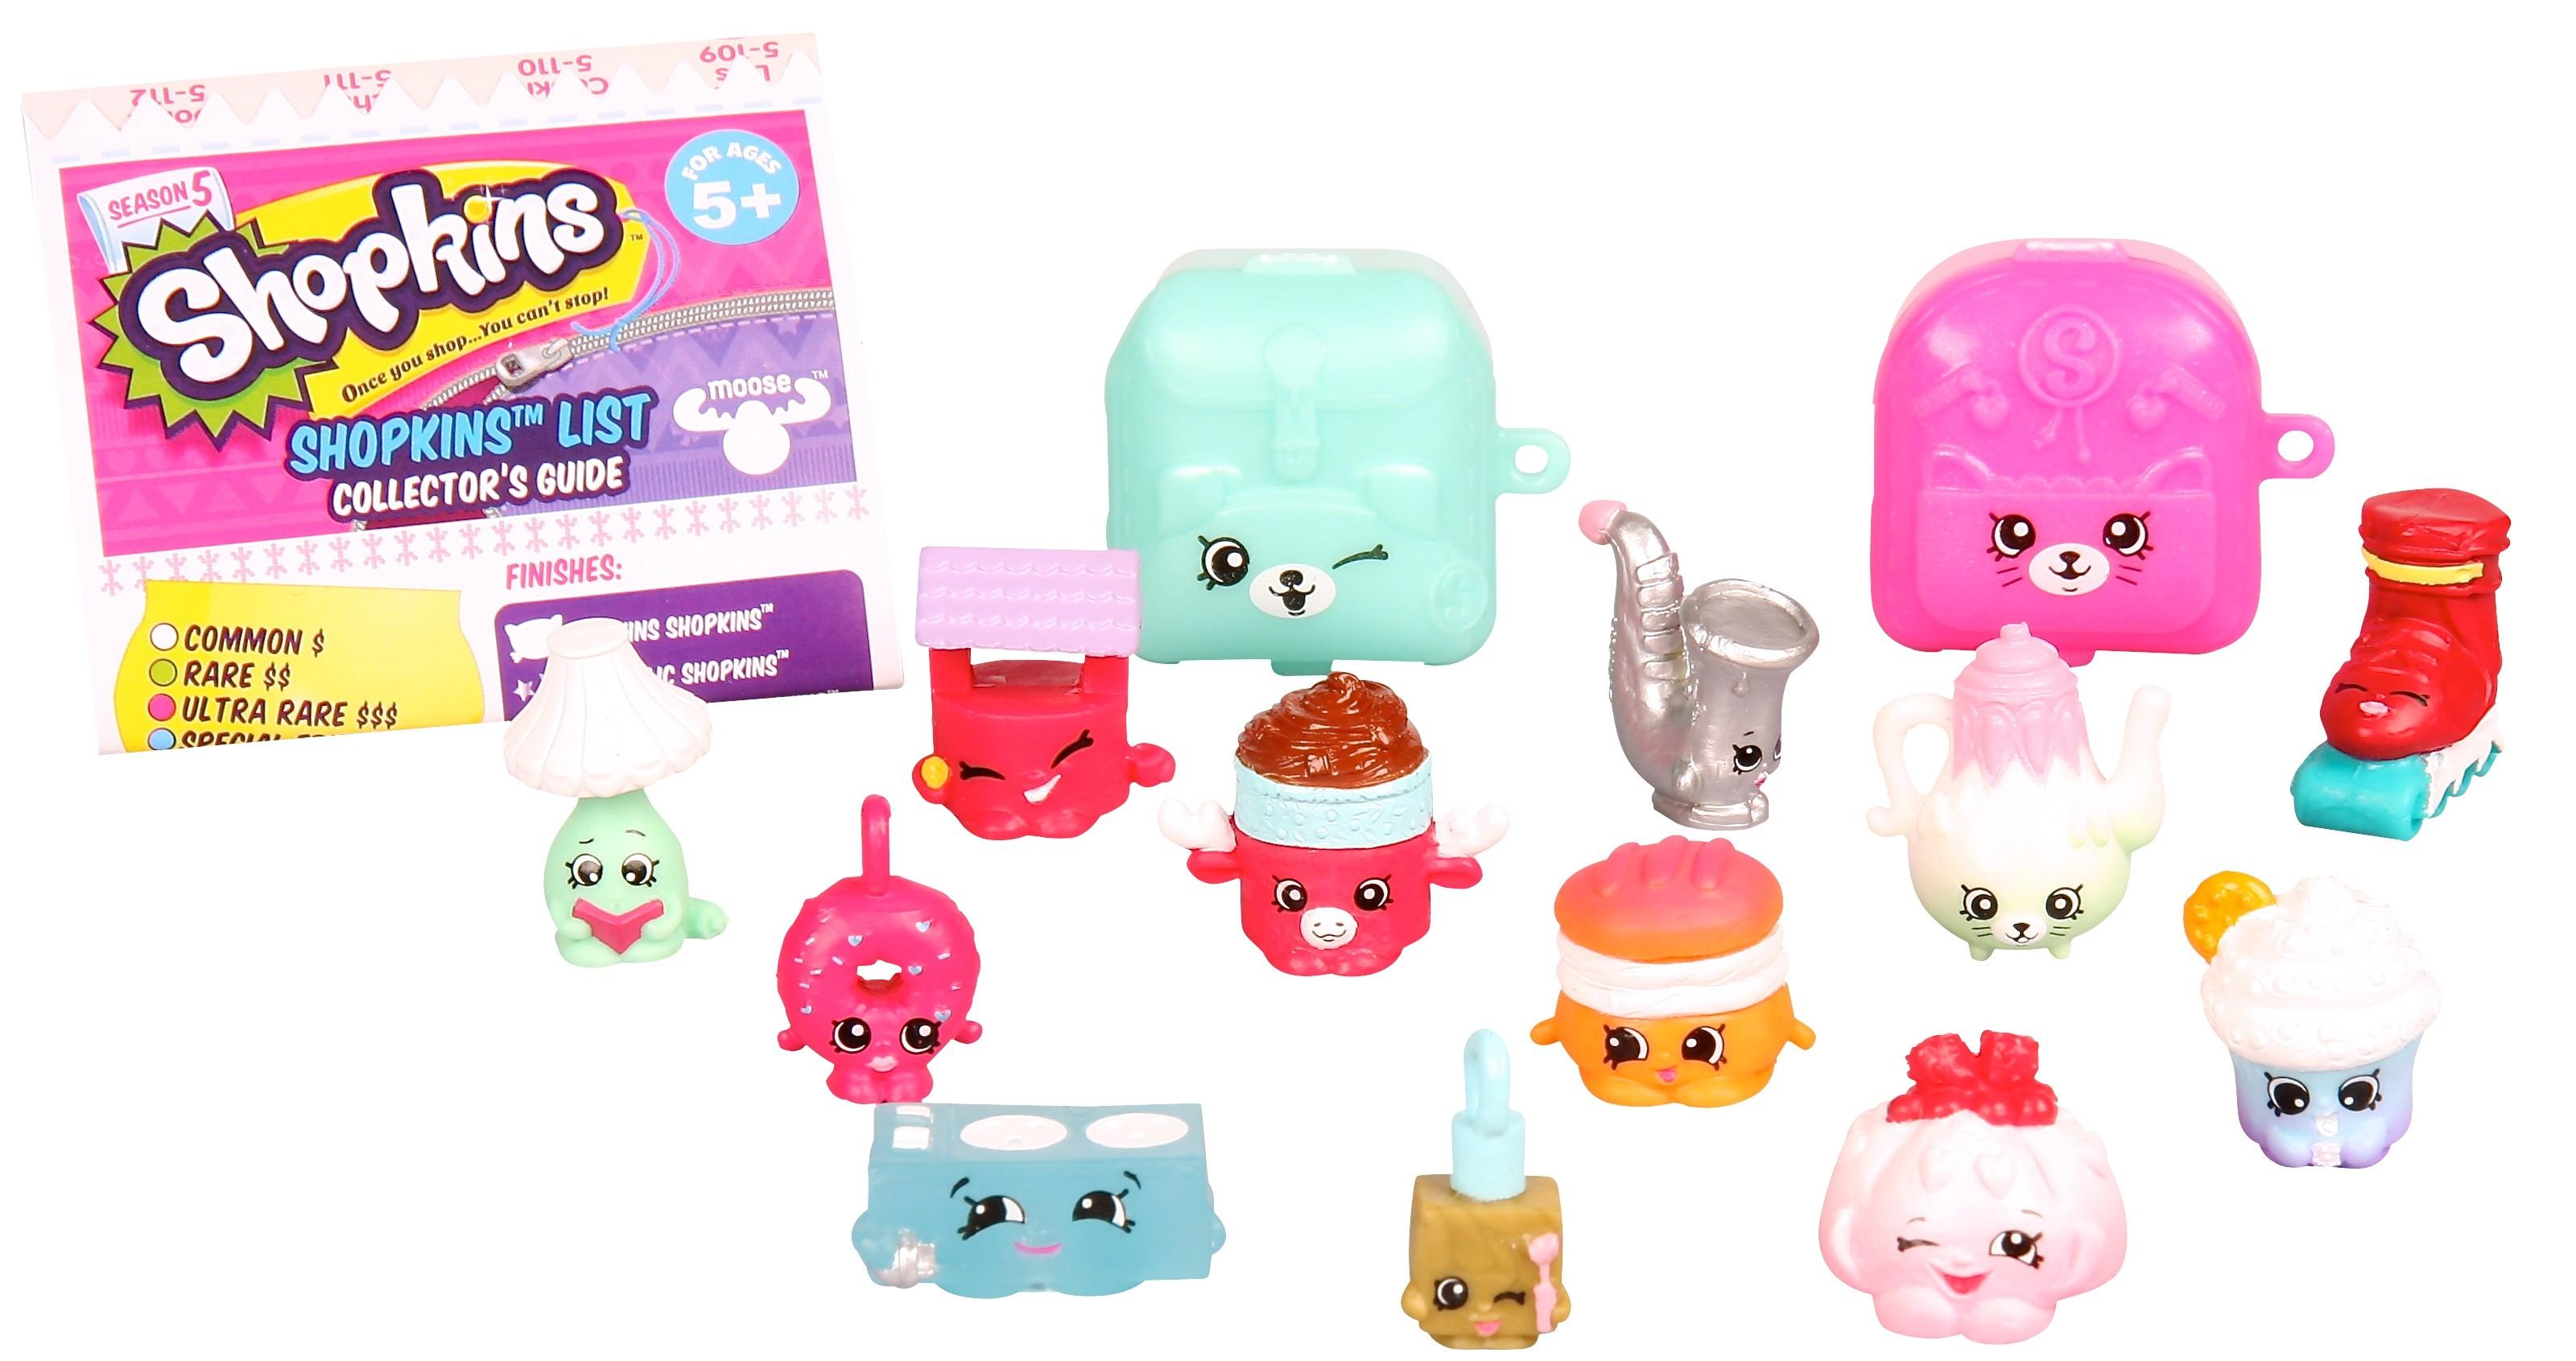 Игровой набор Shopkins 12 фигурок с аксессуарами 5 сезон набор из 5 фигурок shopkins